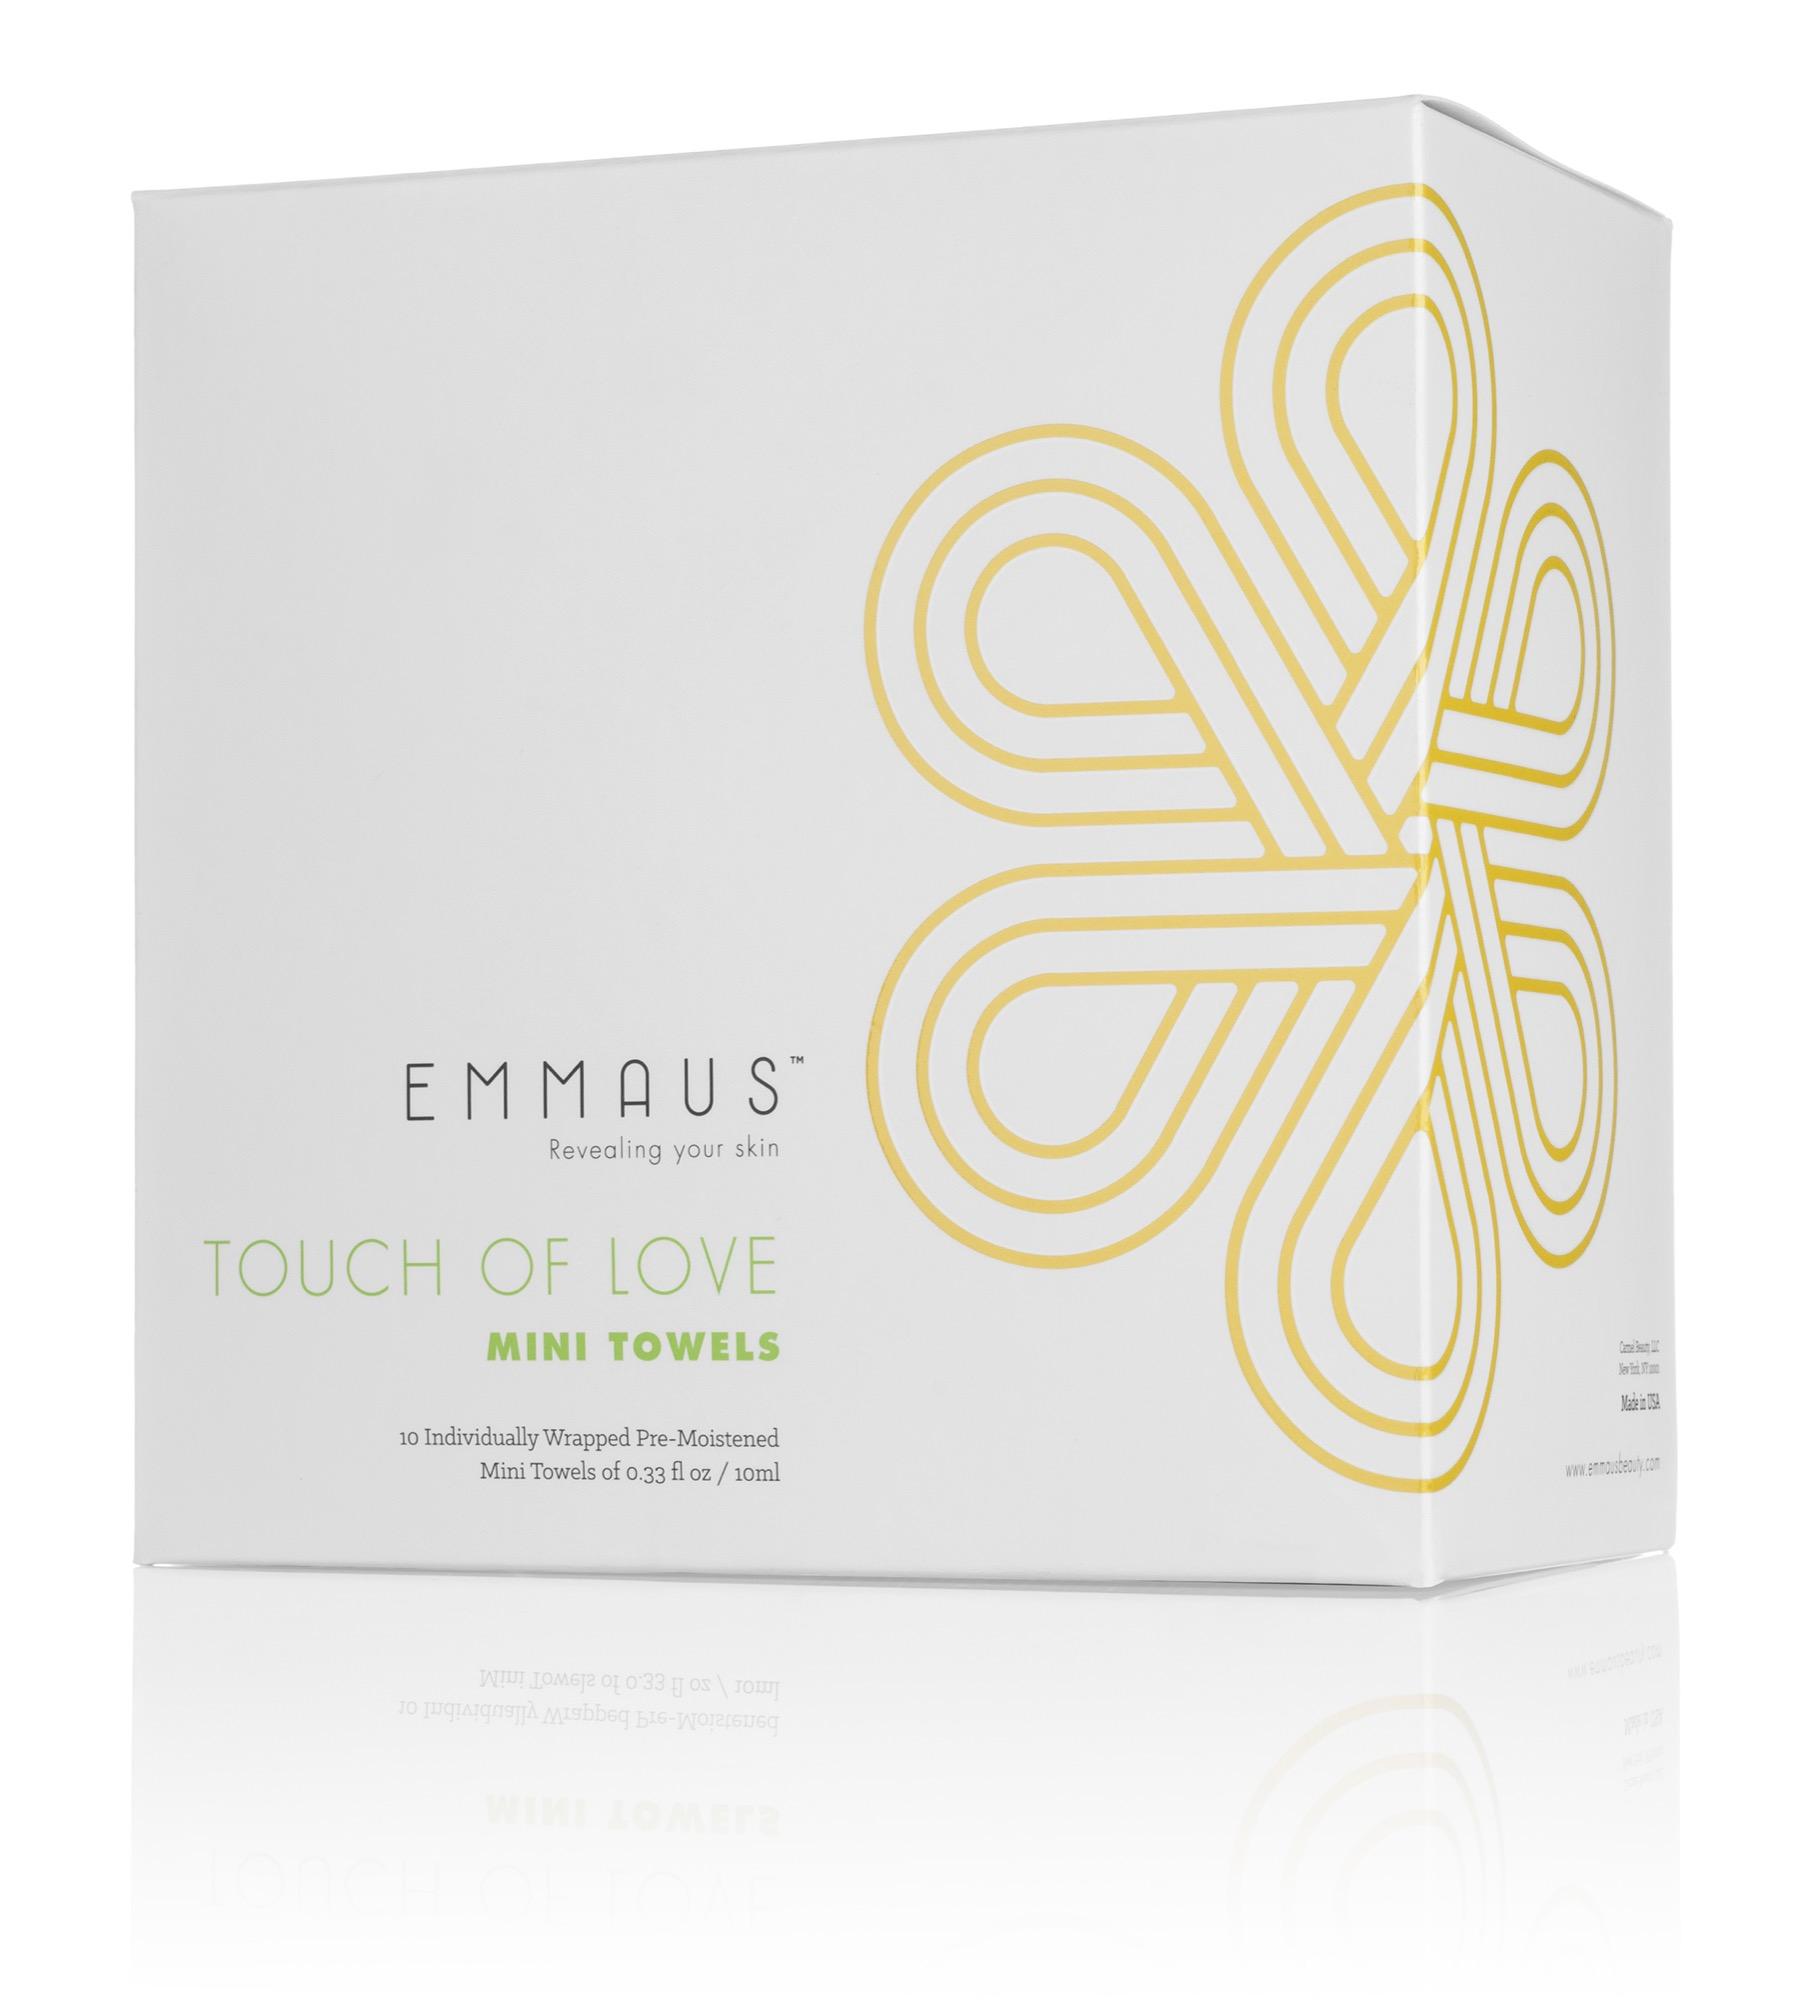 em001.02com-emmaus-touch-of-love-mini-towels.jpg